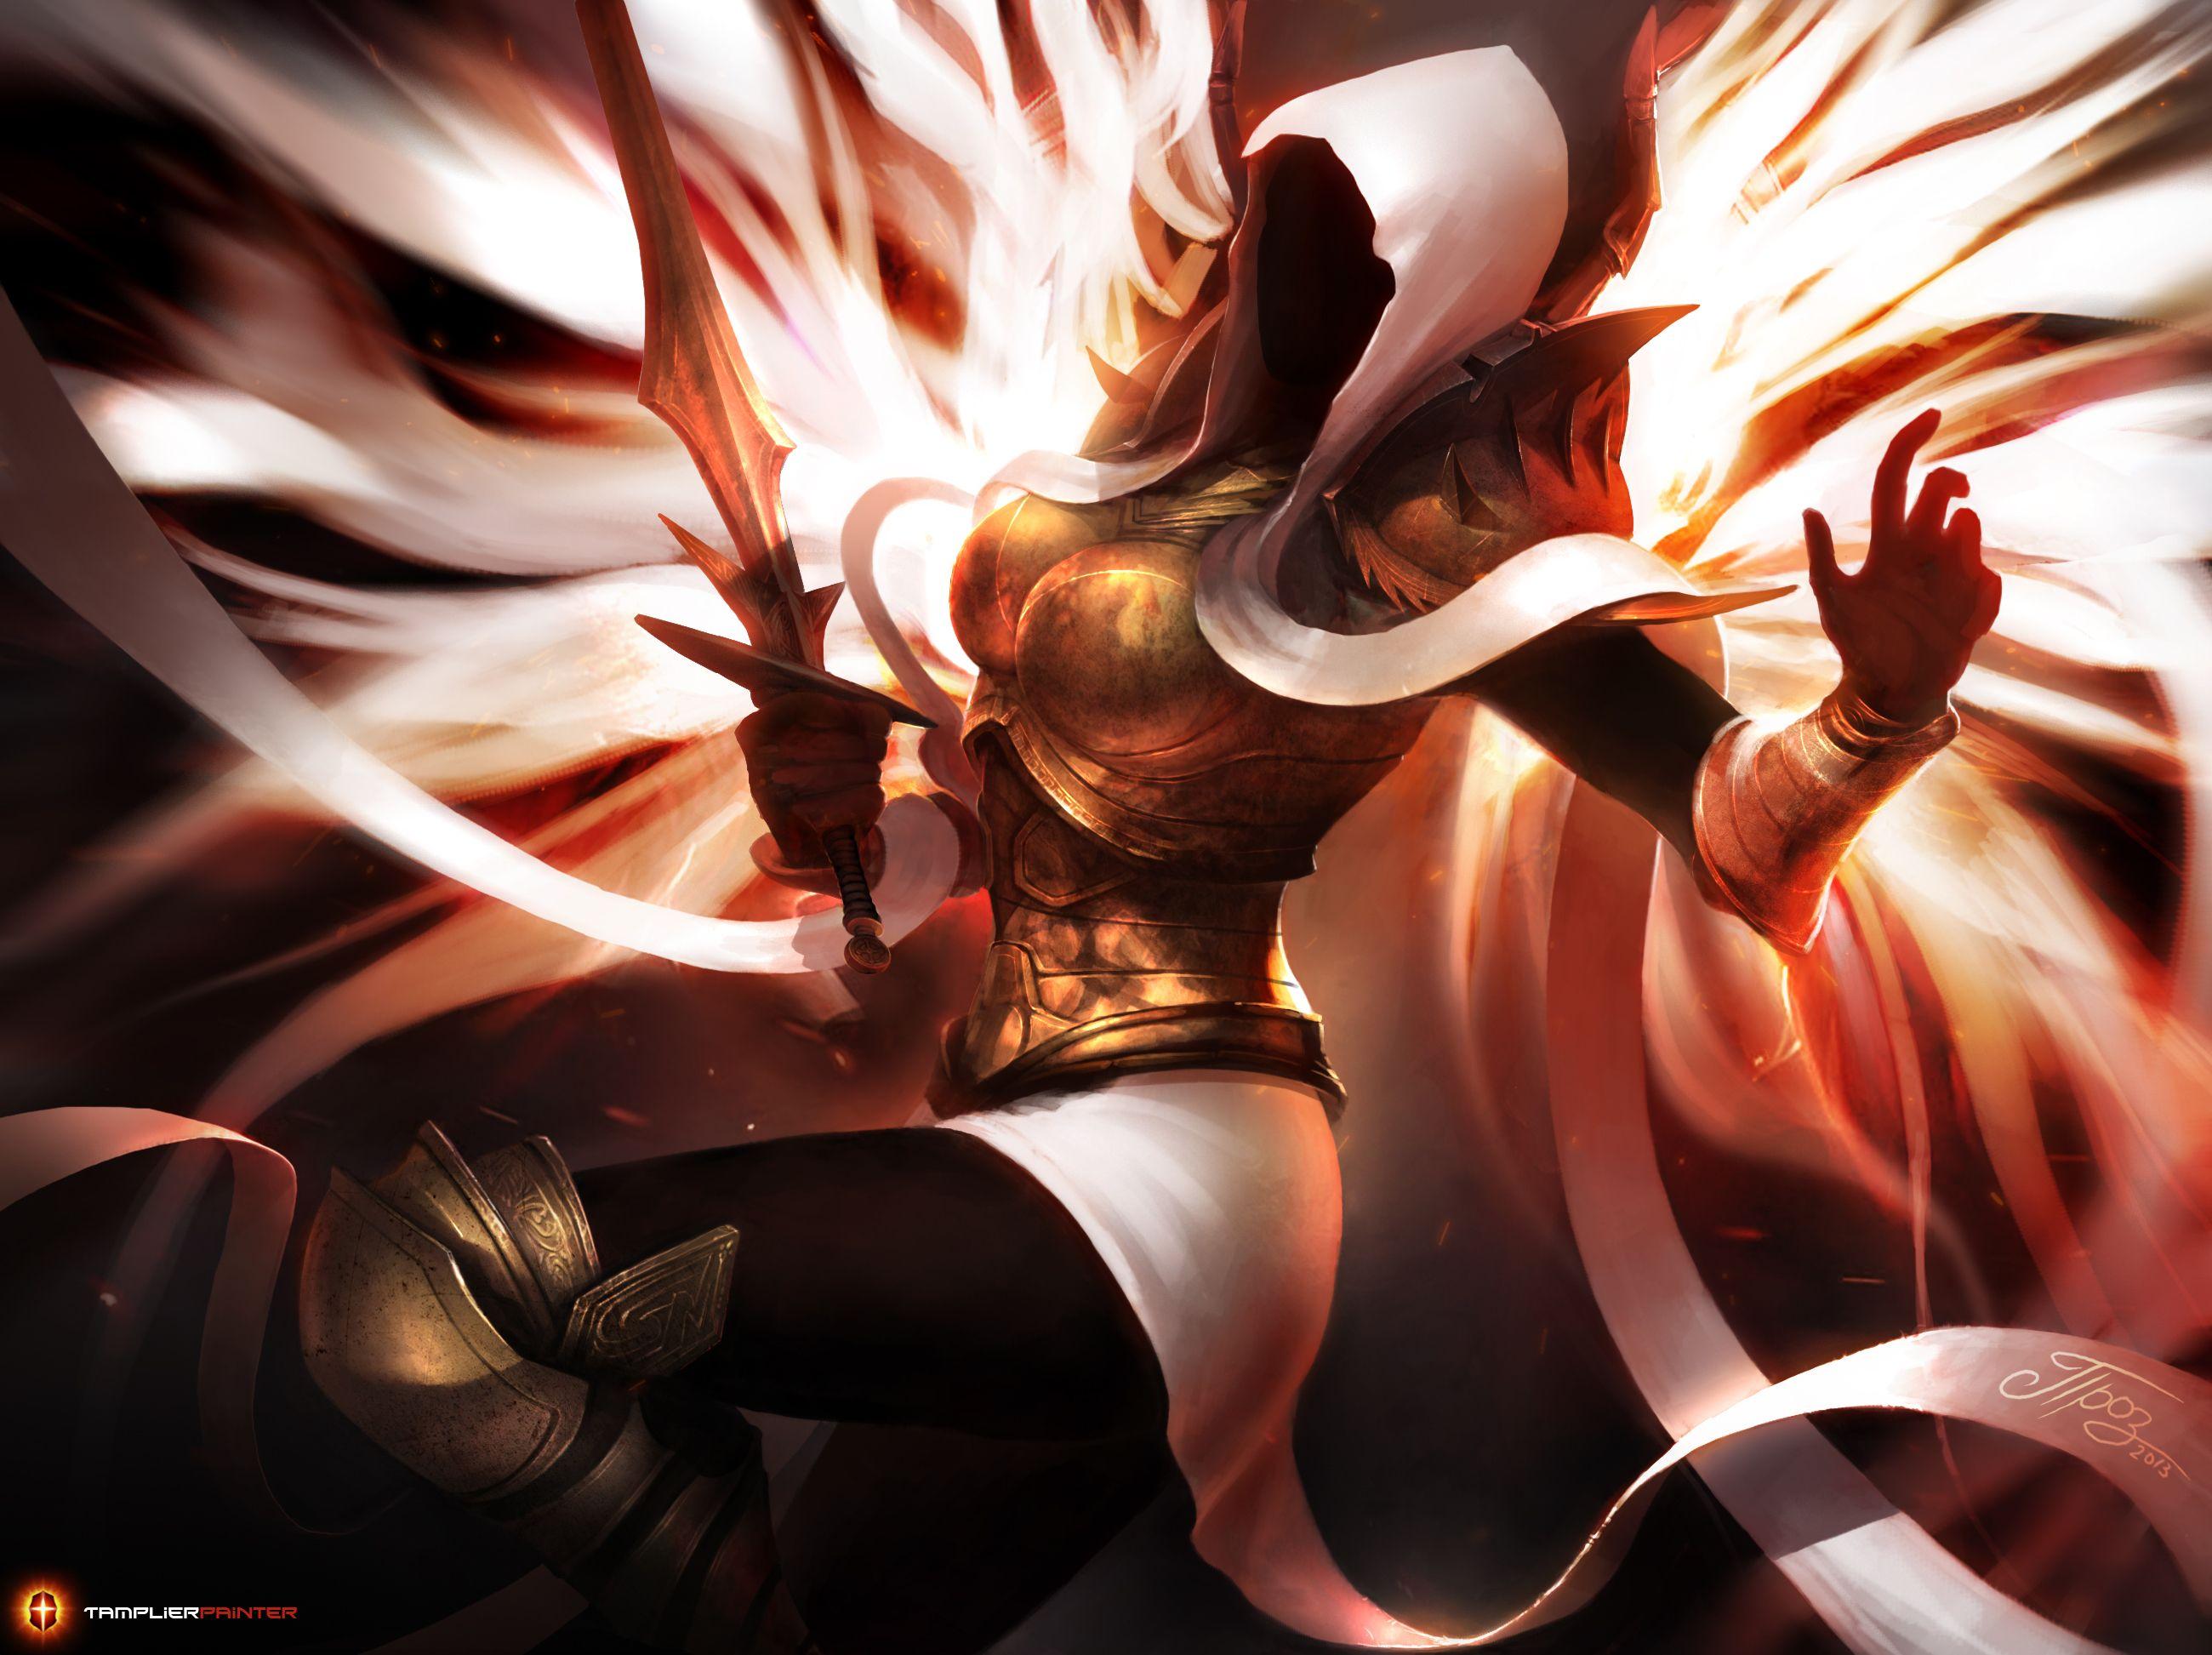 E621 2013 Angel Armor Auriel Diablo 3 Female Hi Res Melee Weapon Sword Tamplierpainter Wings